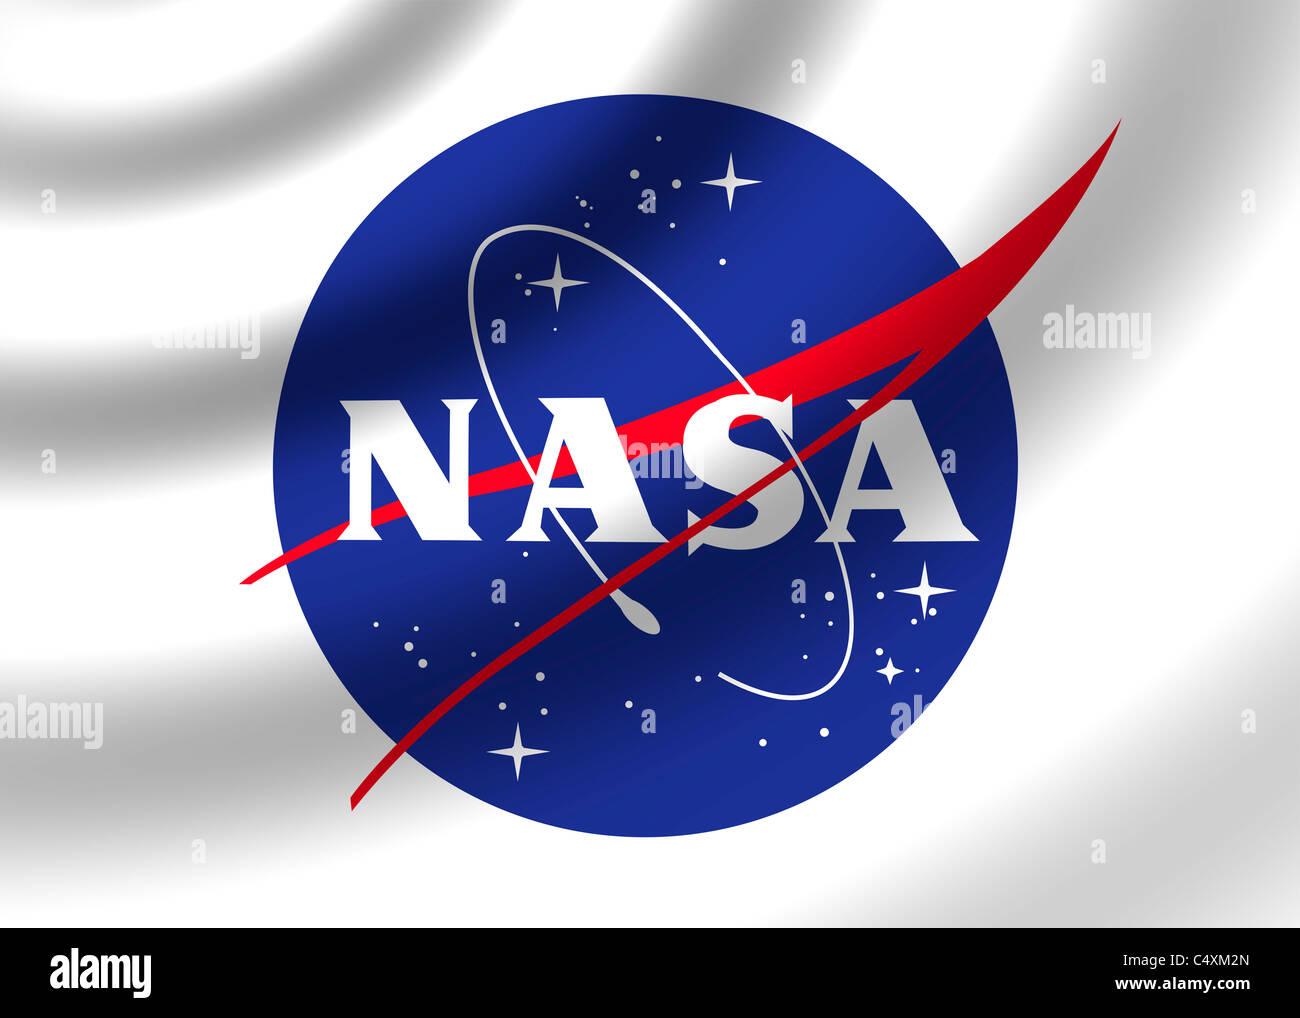 NASA logo flag symbol - Stock Image